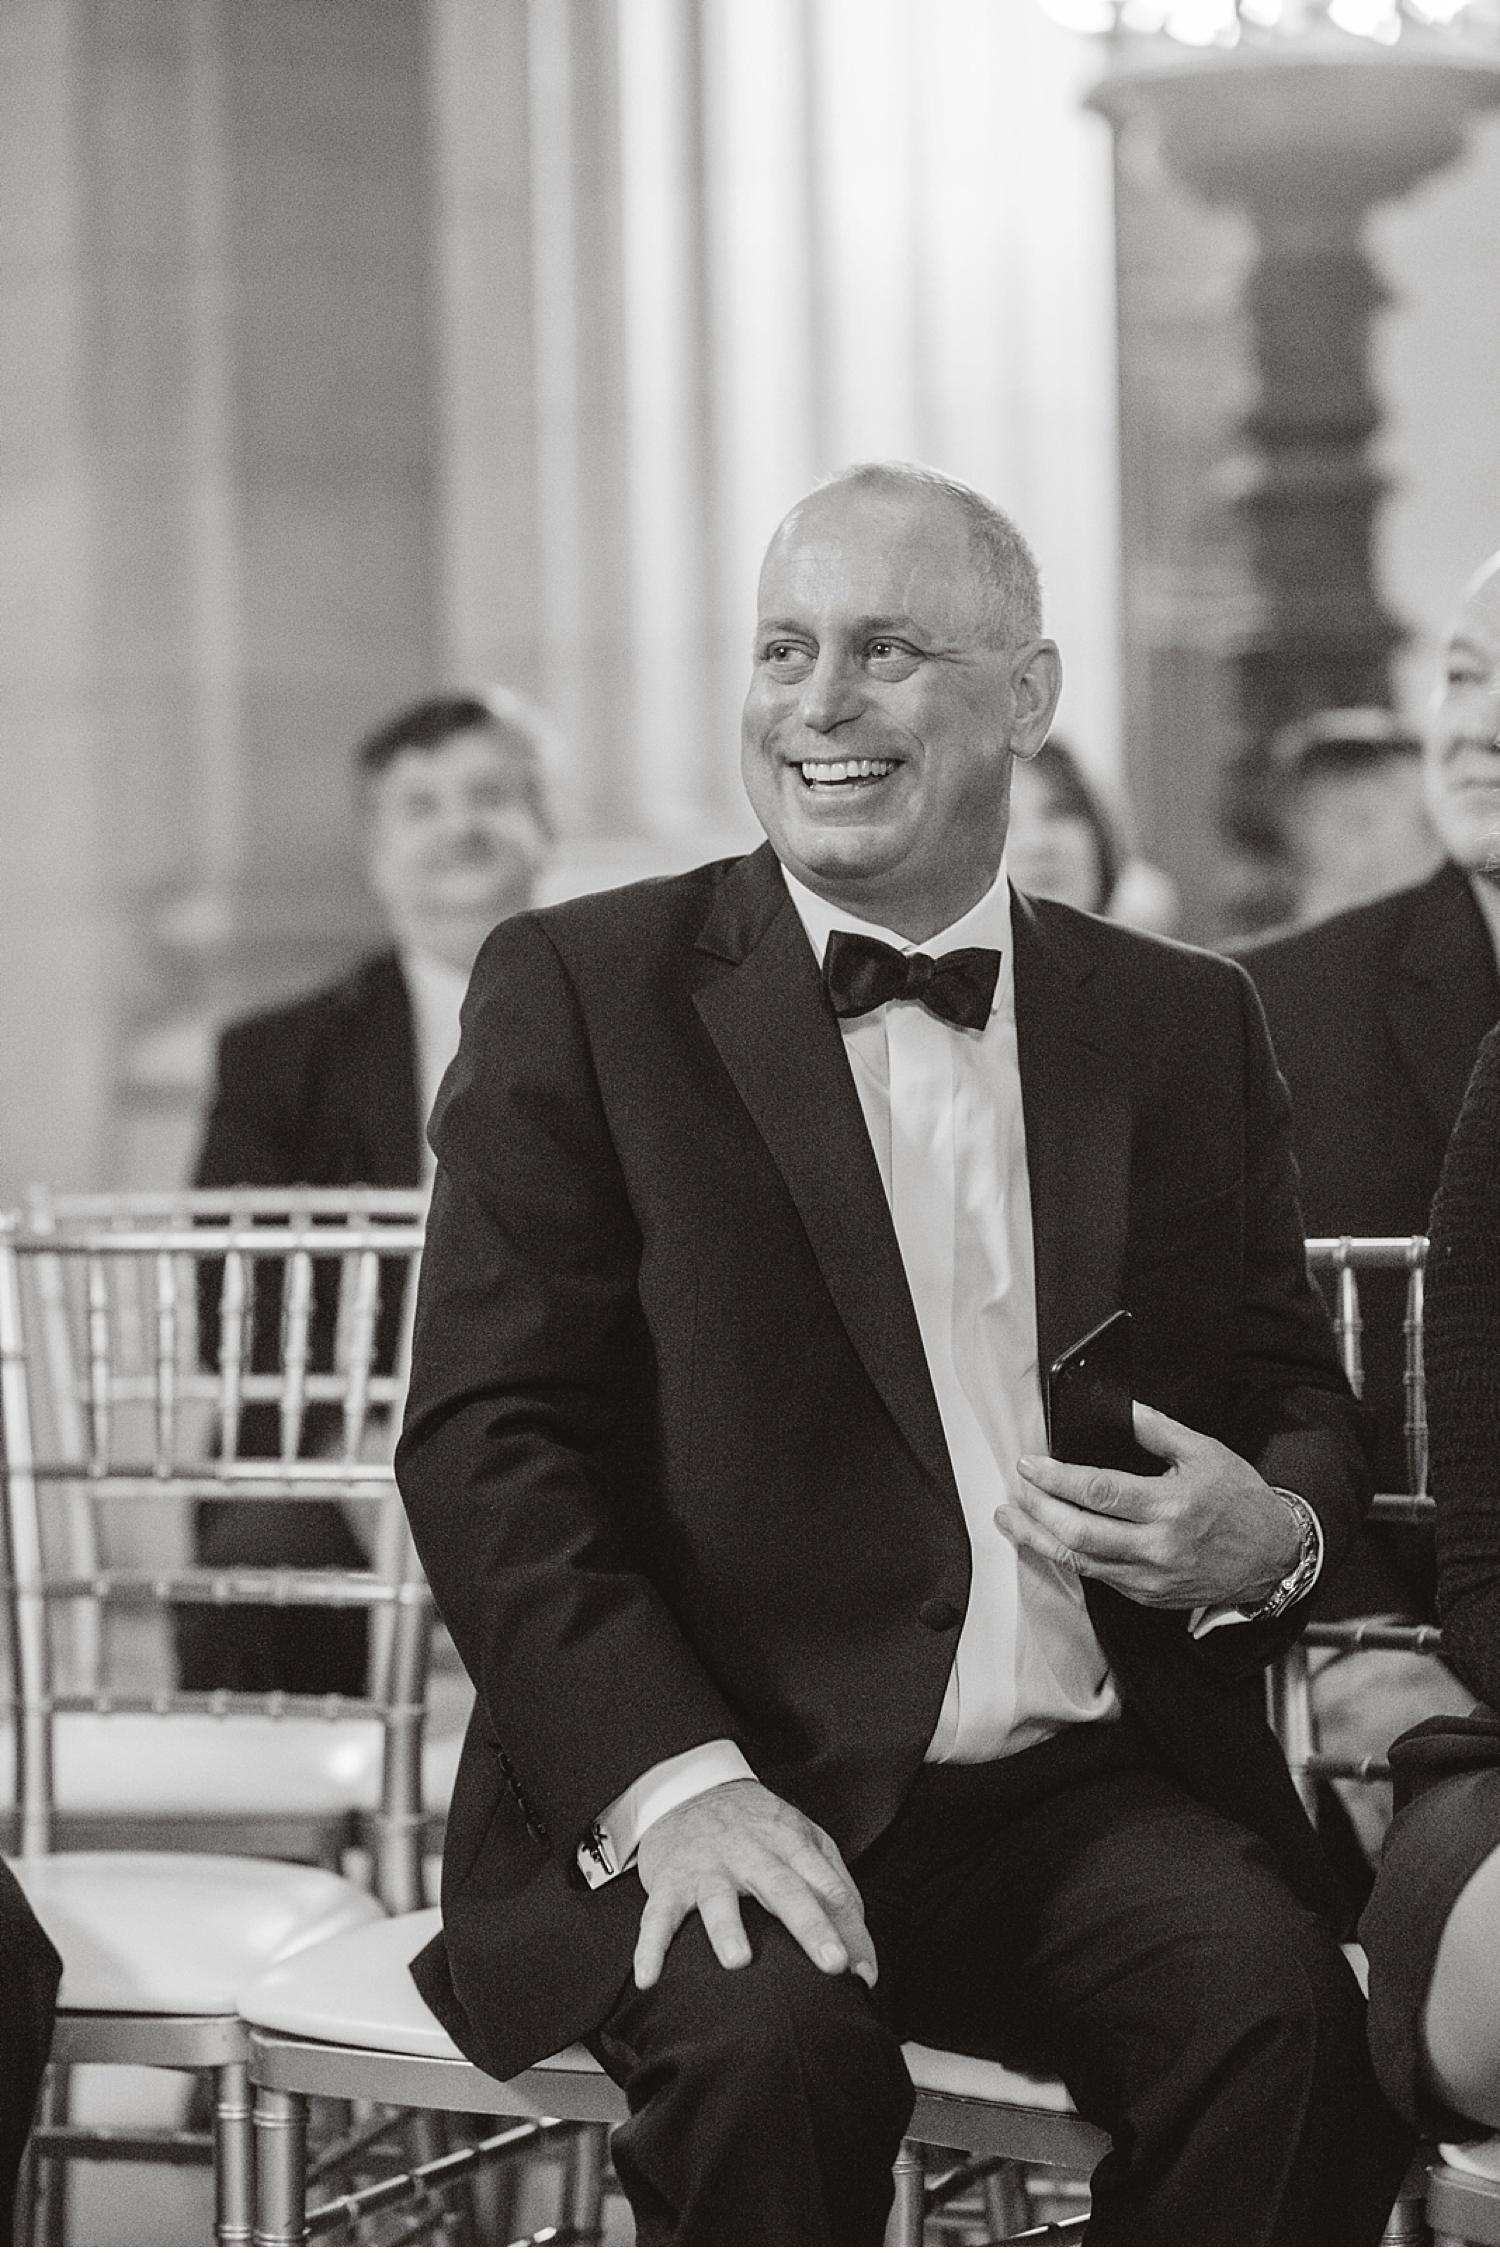 cleveland city hall wedding_093.jpg